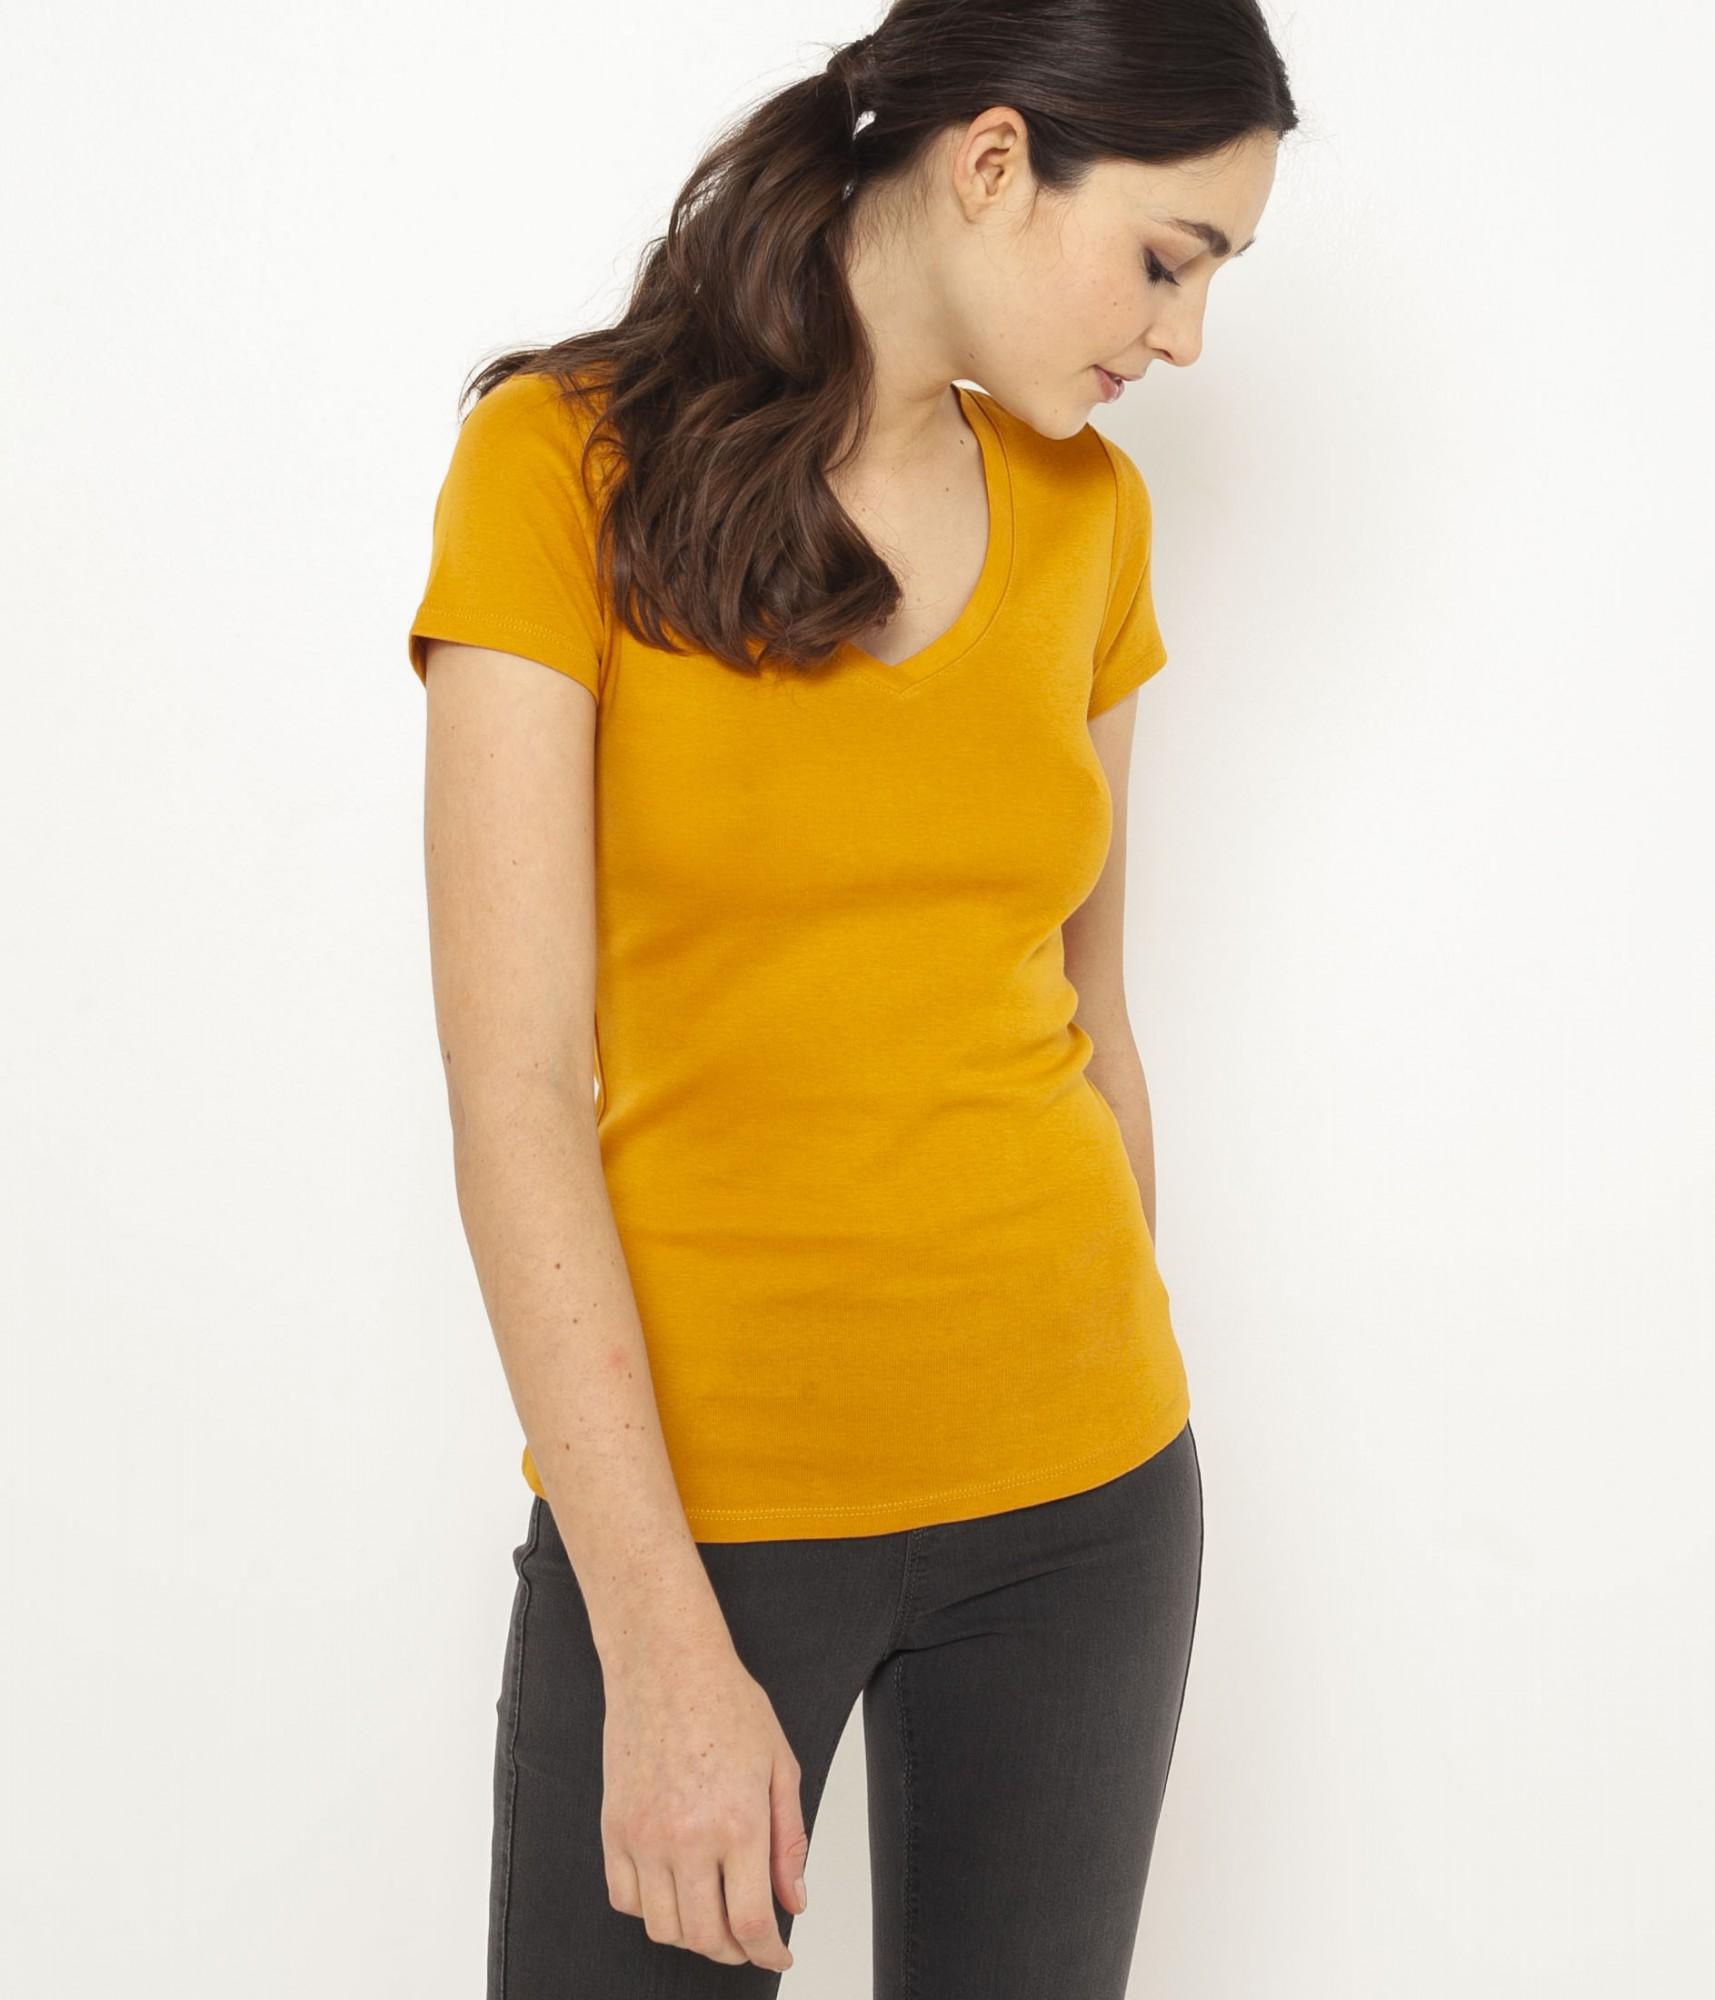 CAMAIEU Women's t-shirt mustard